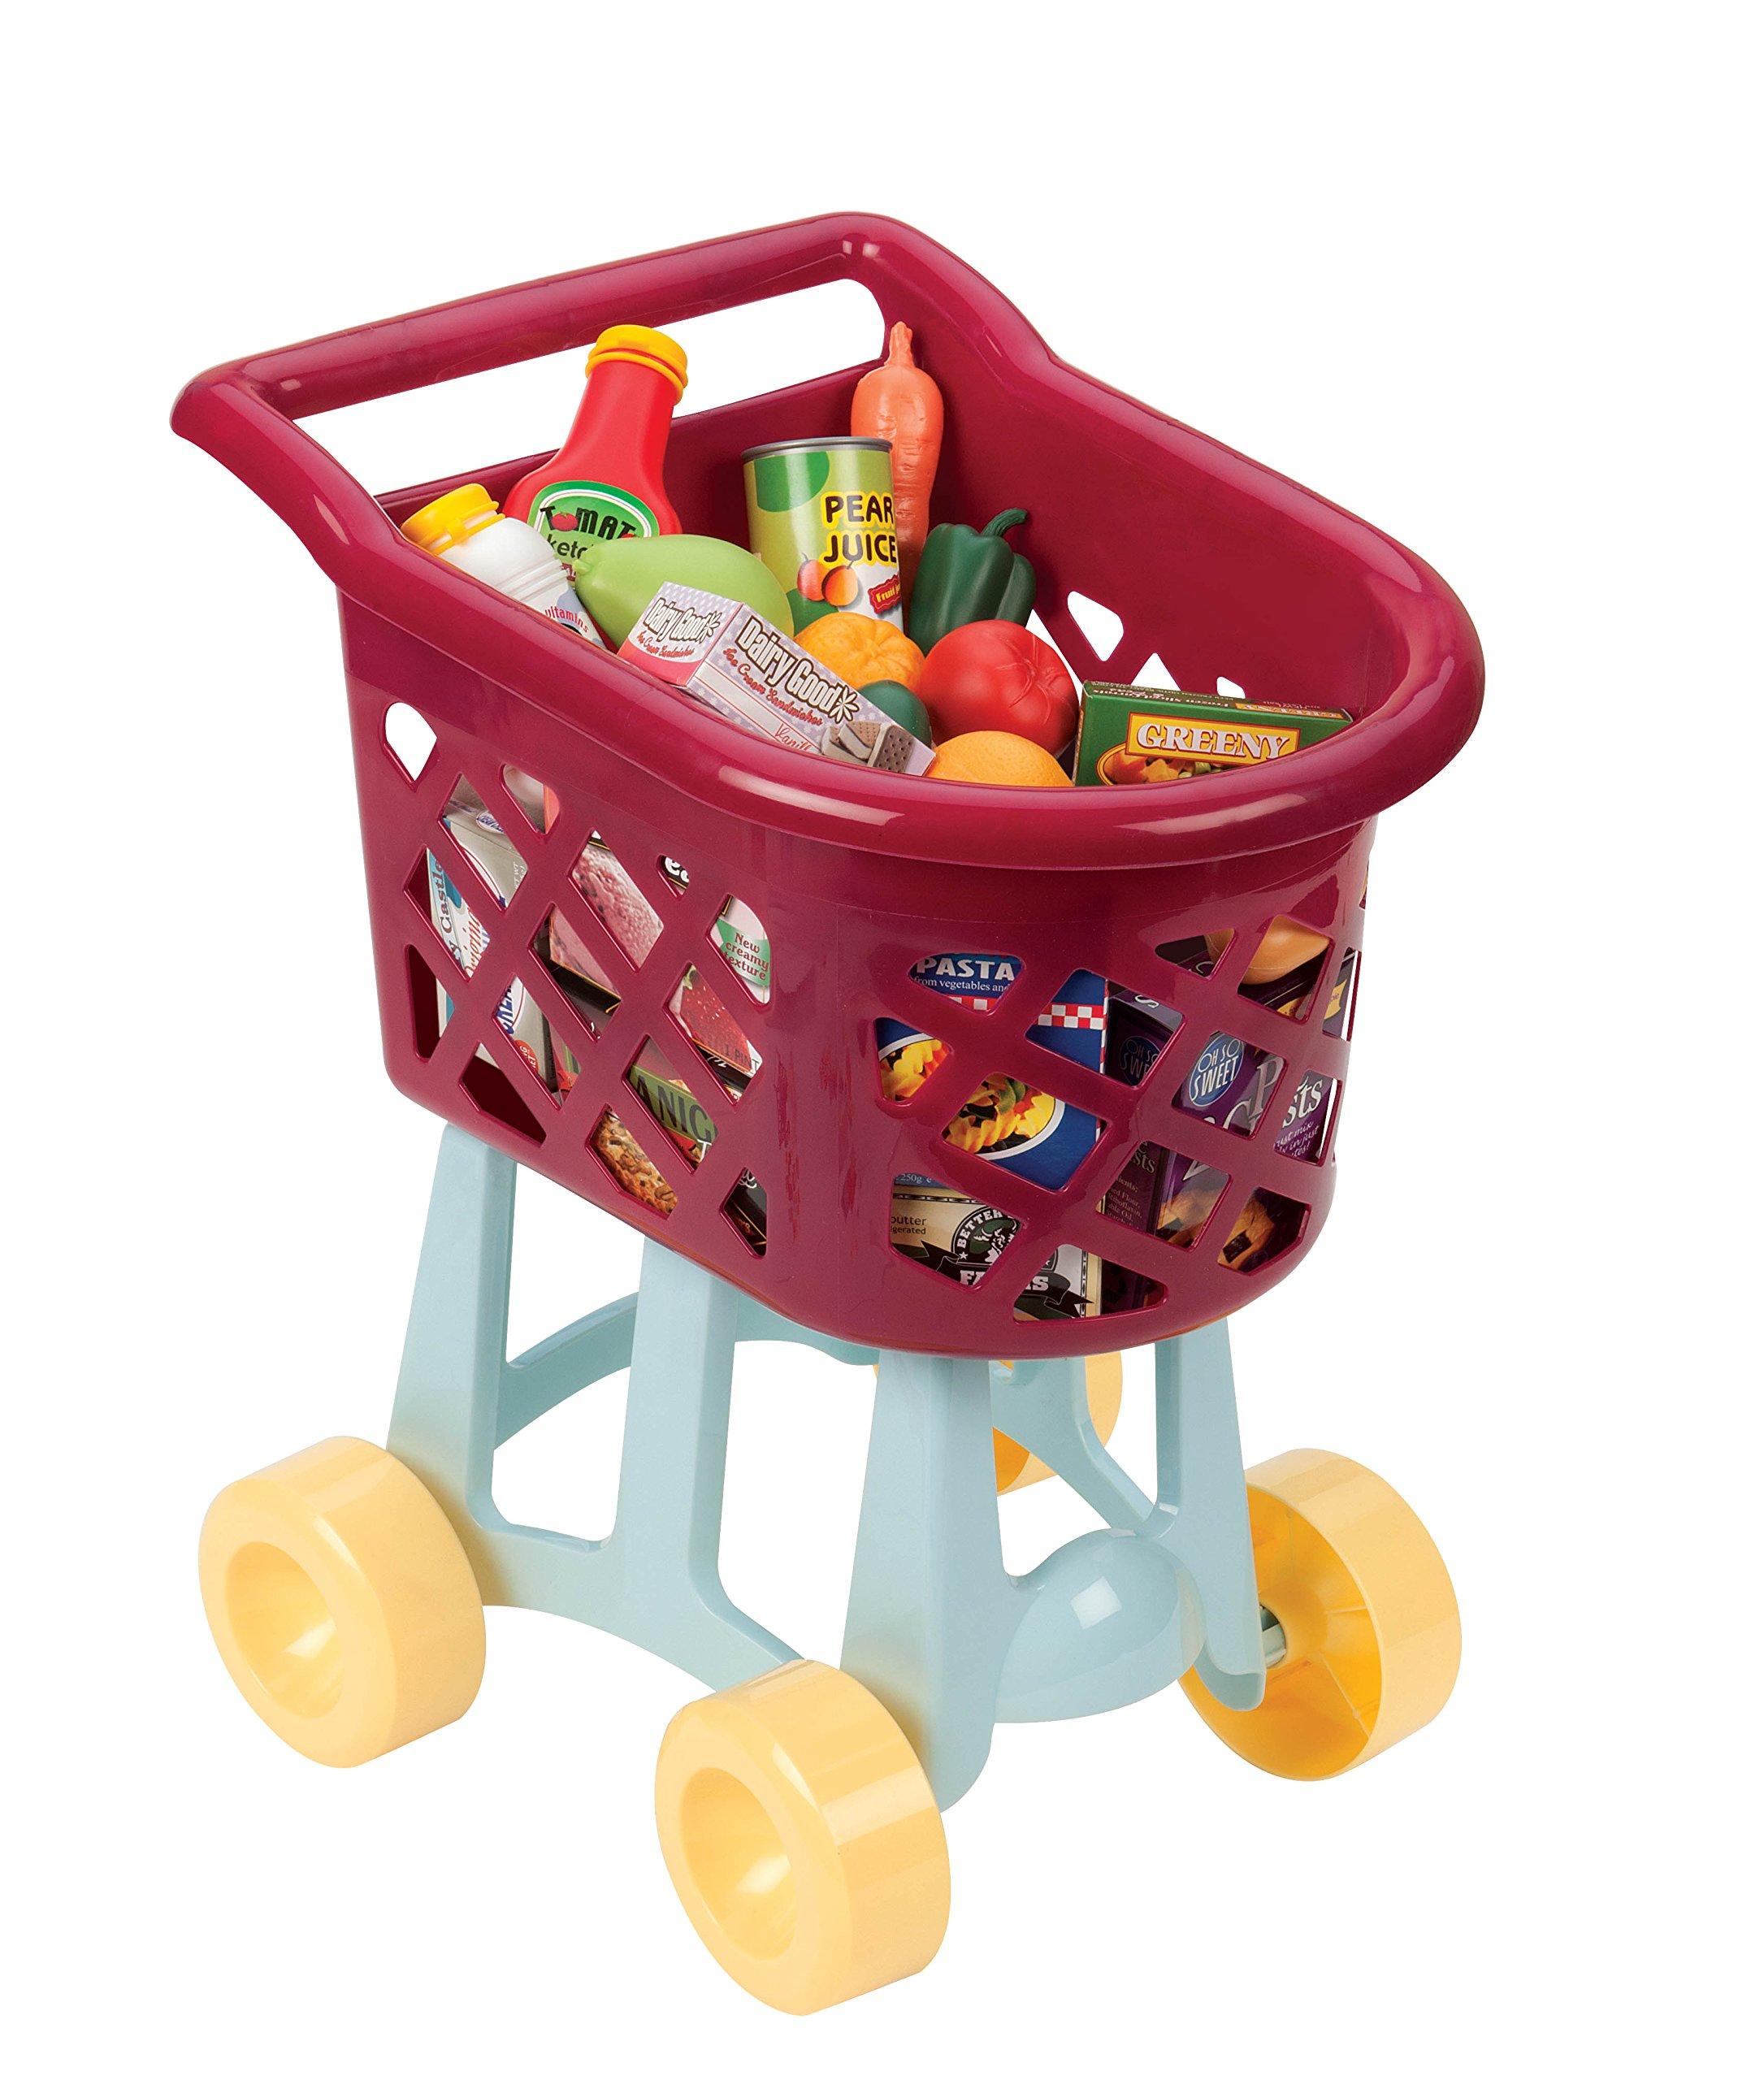 Grocery Cart by Battat